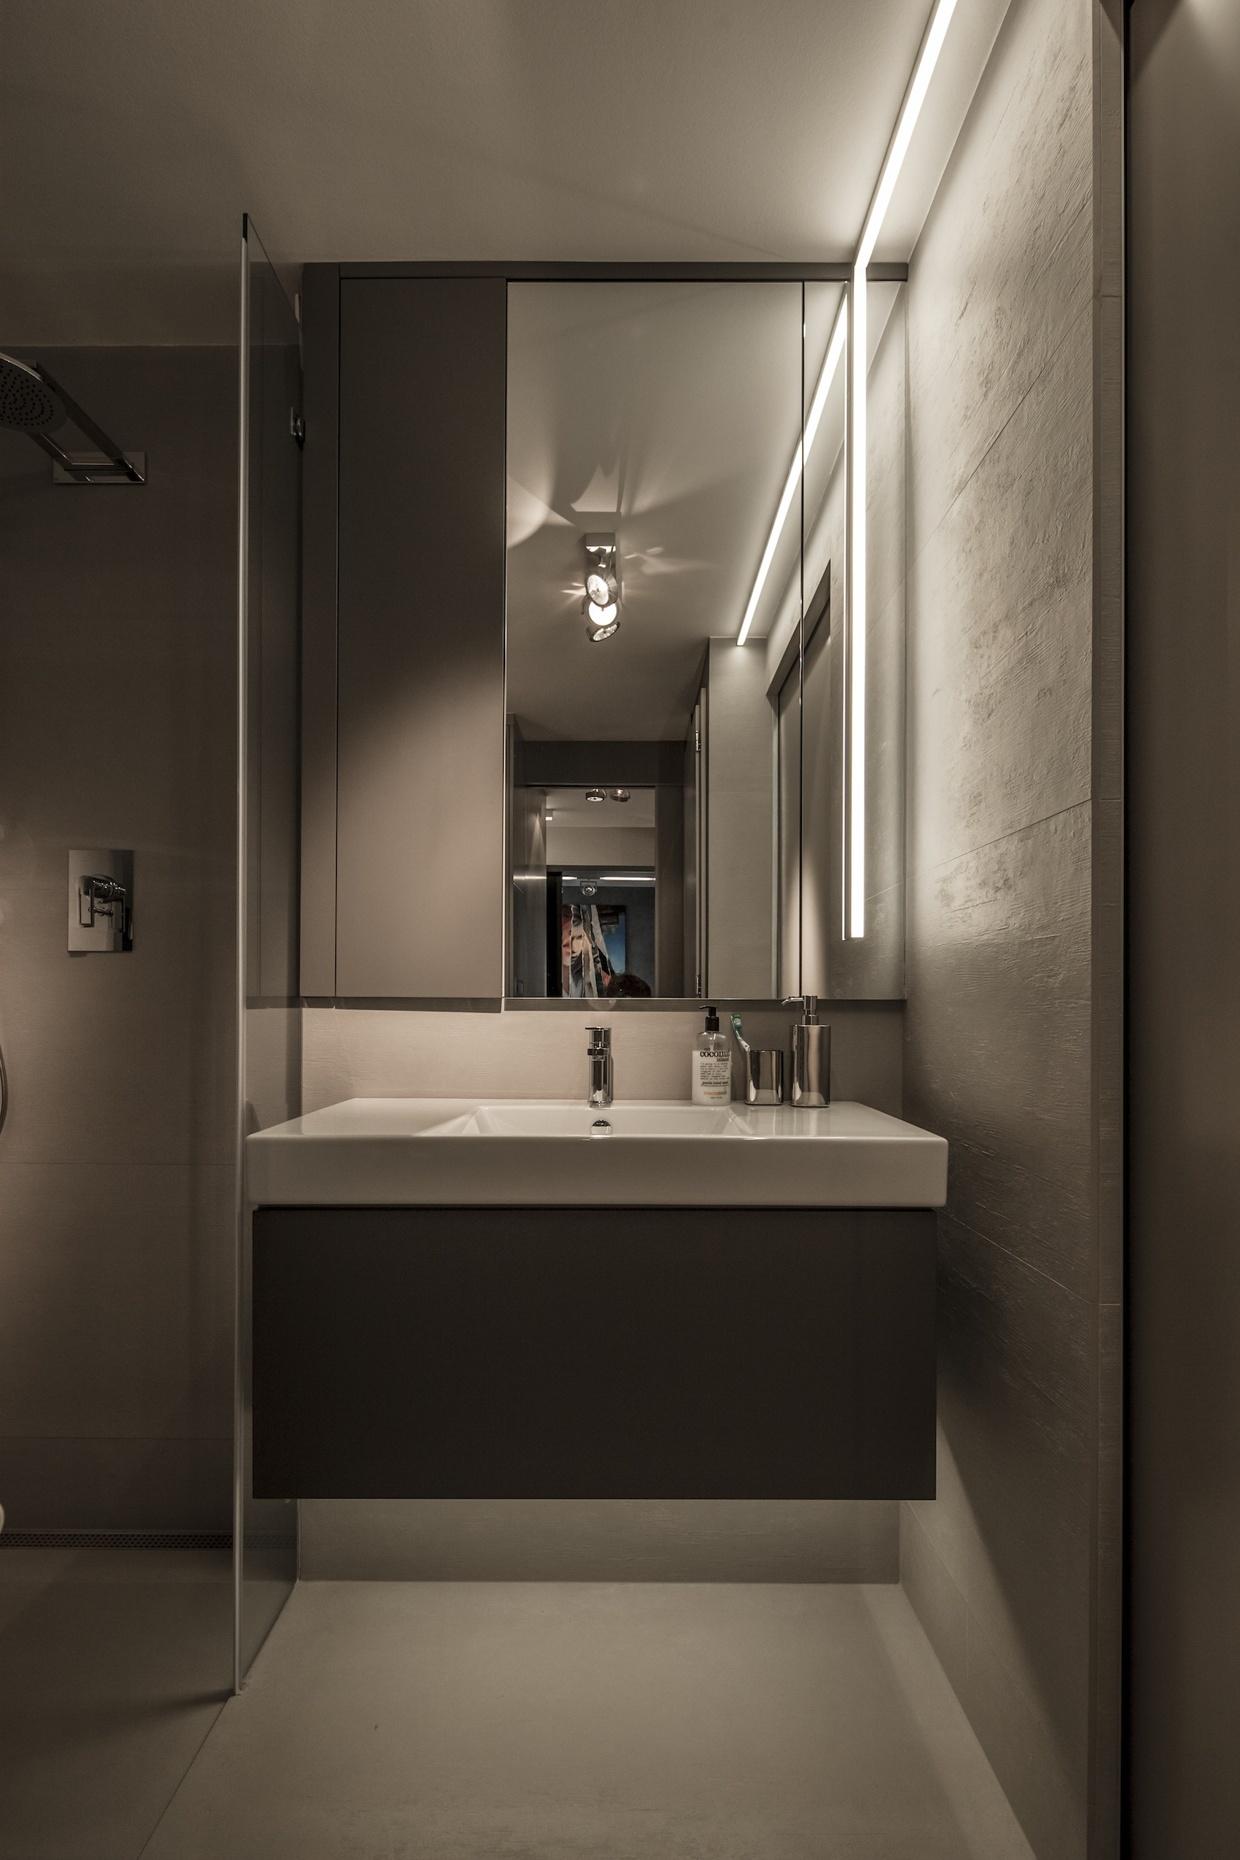 апартамент 40 кв. м - 19